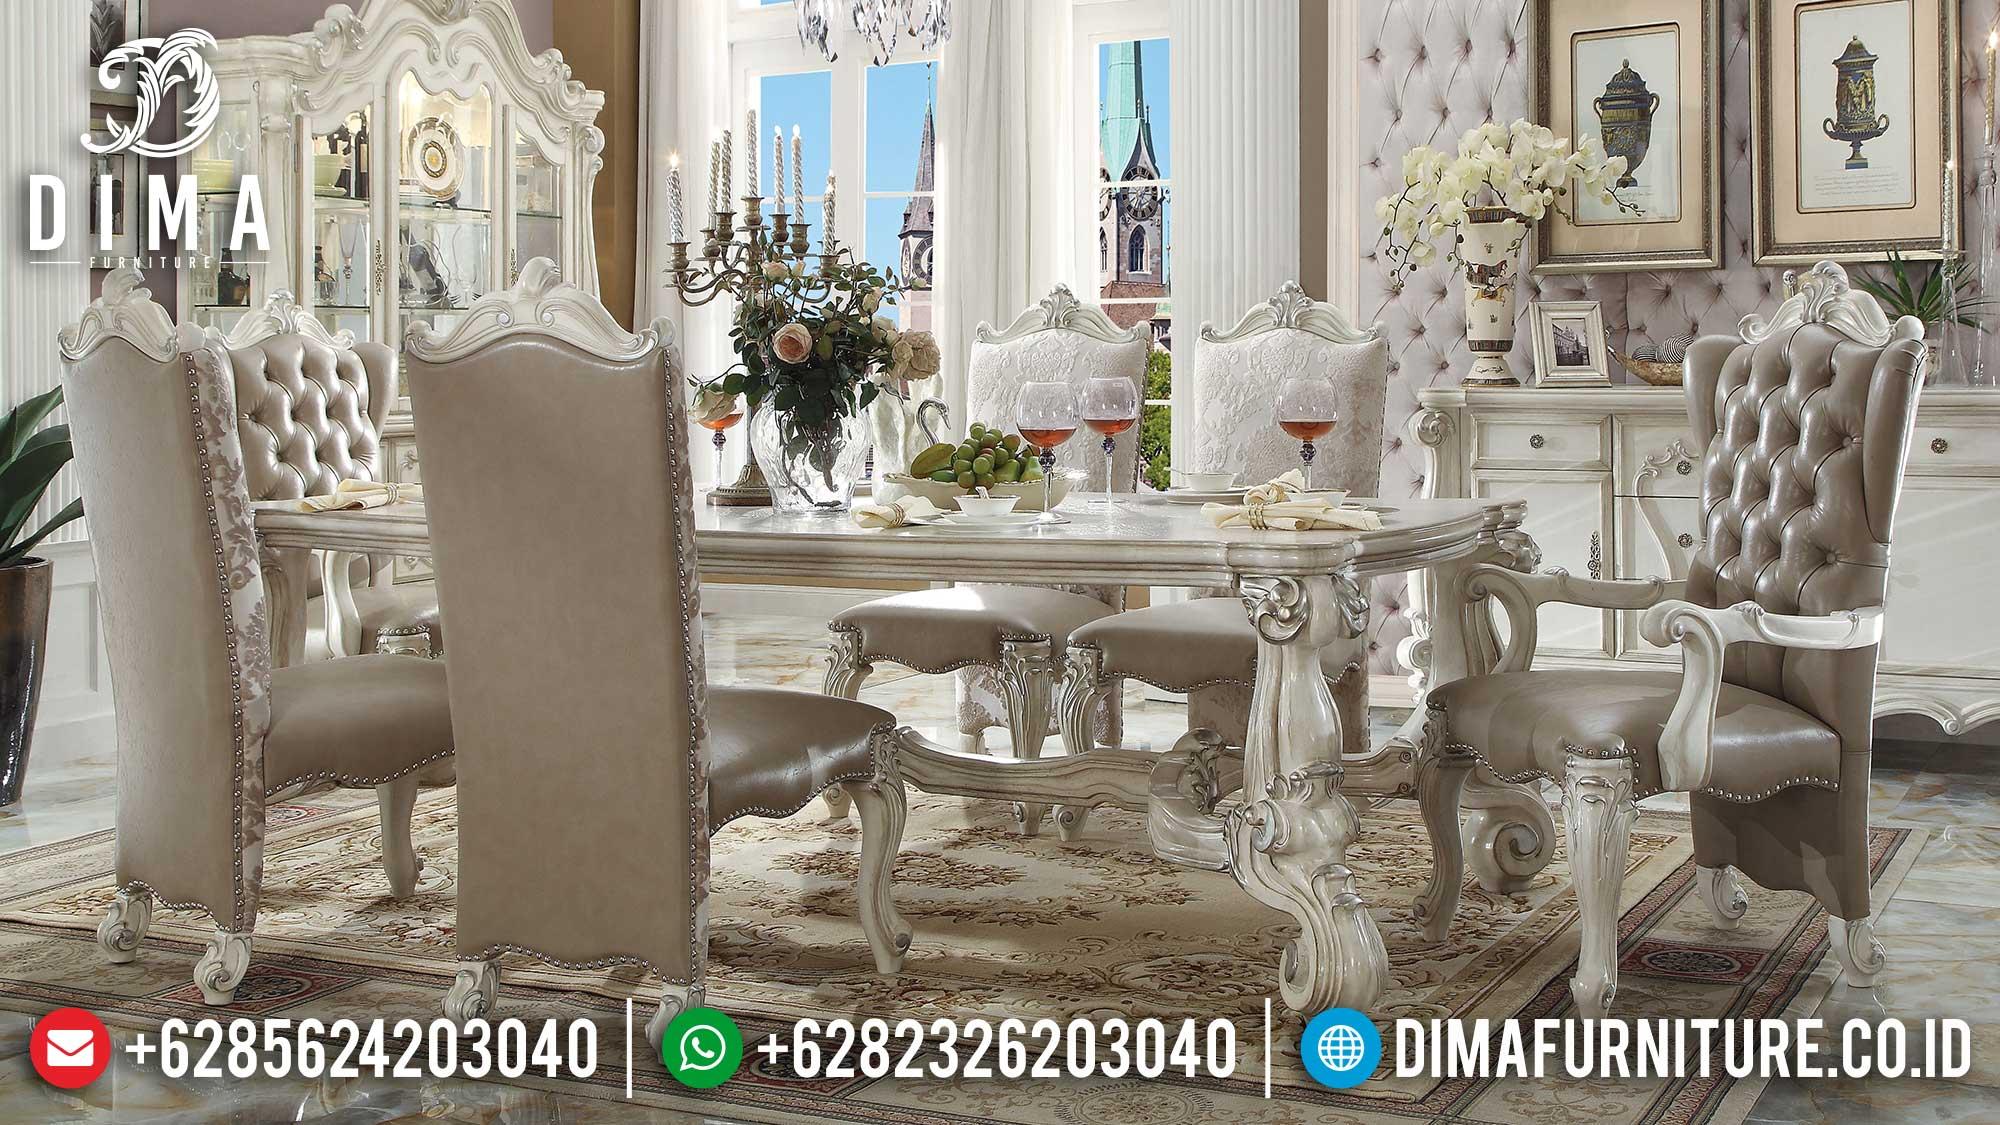 New Set Meja Makan Mewah Imperial Kingdom Majestic Luxury Classic Carving St-1247